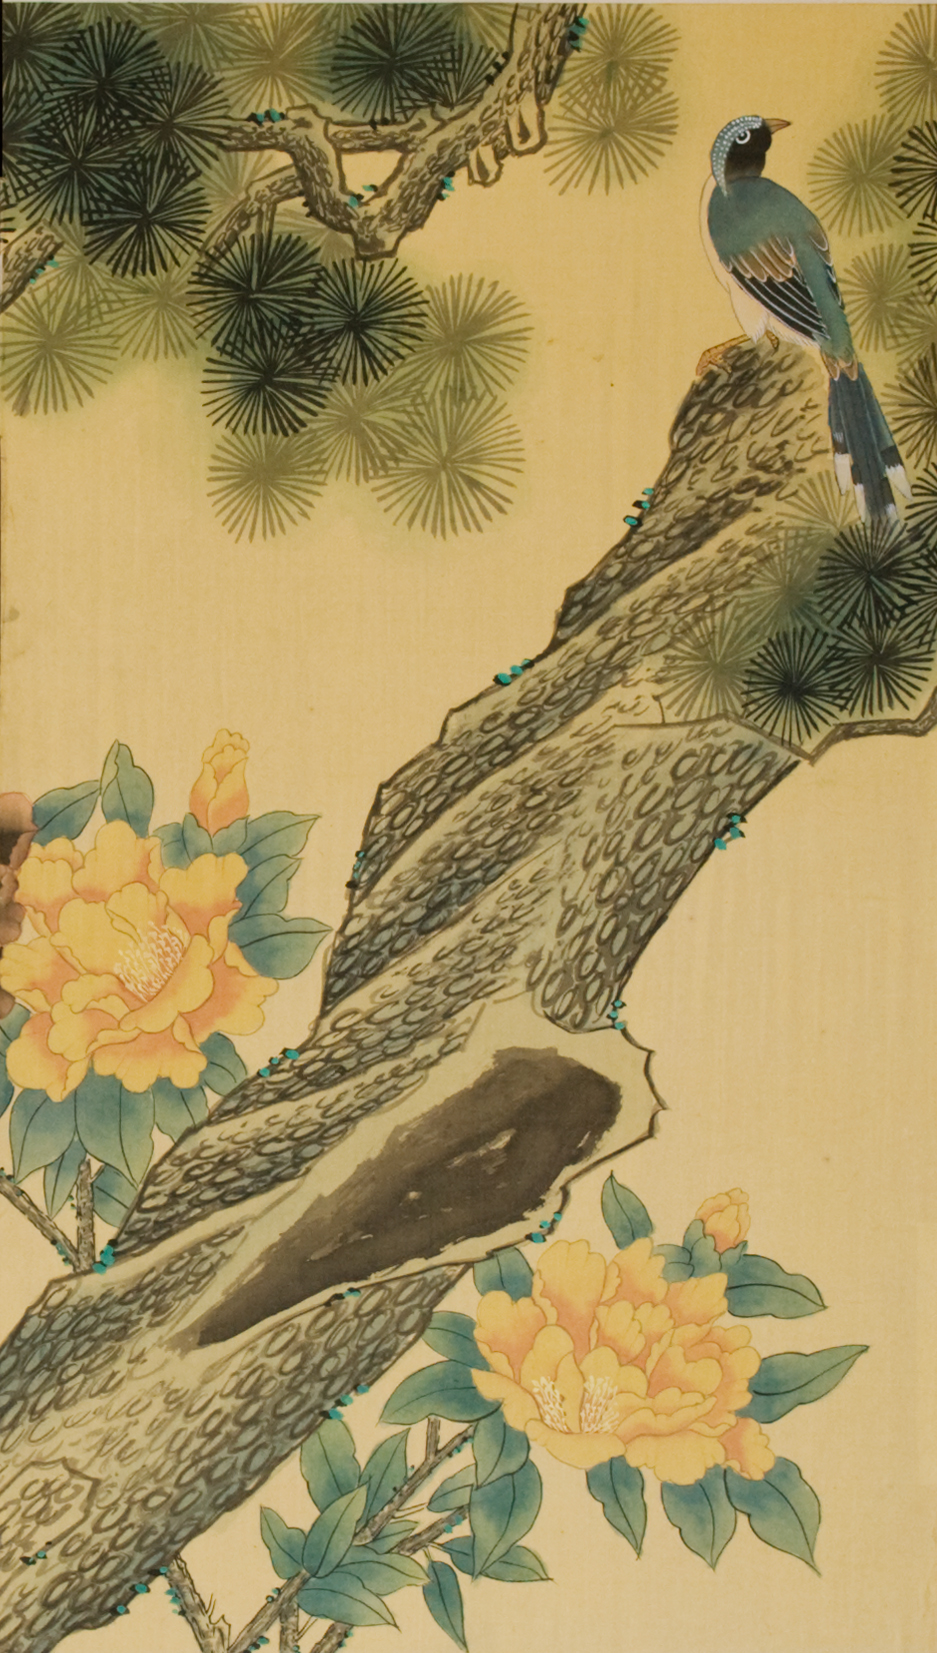 bird-and-trunk.jpg